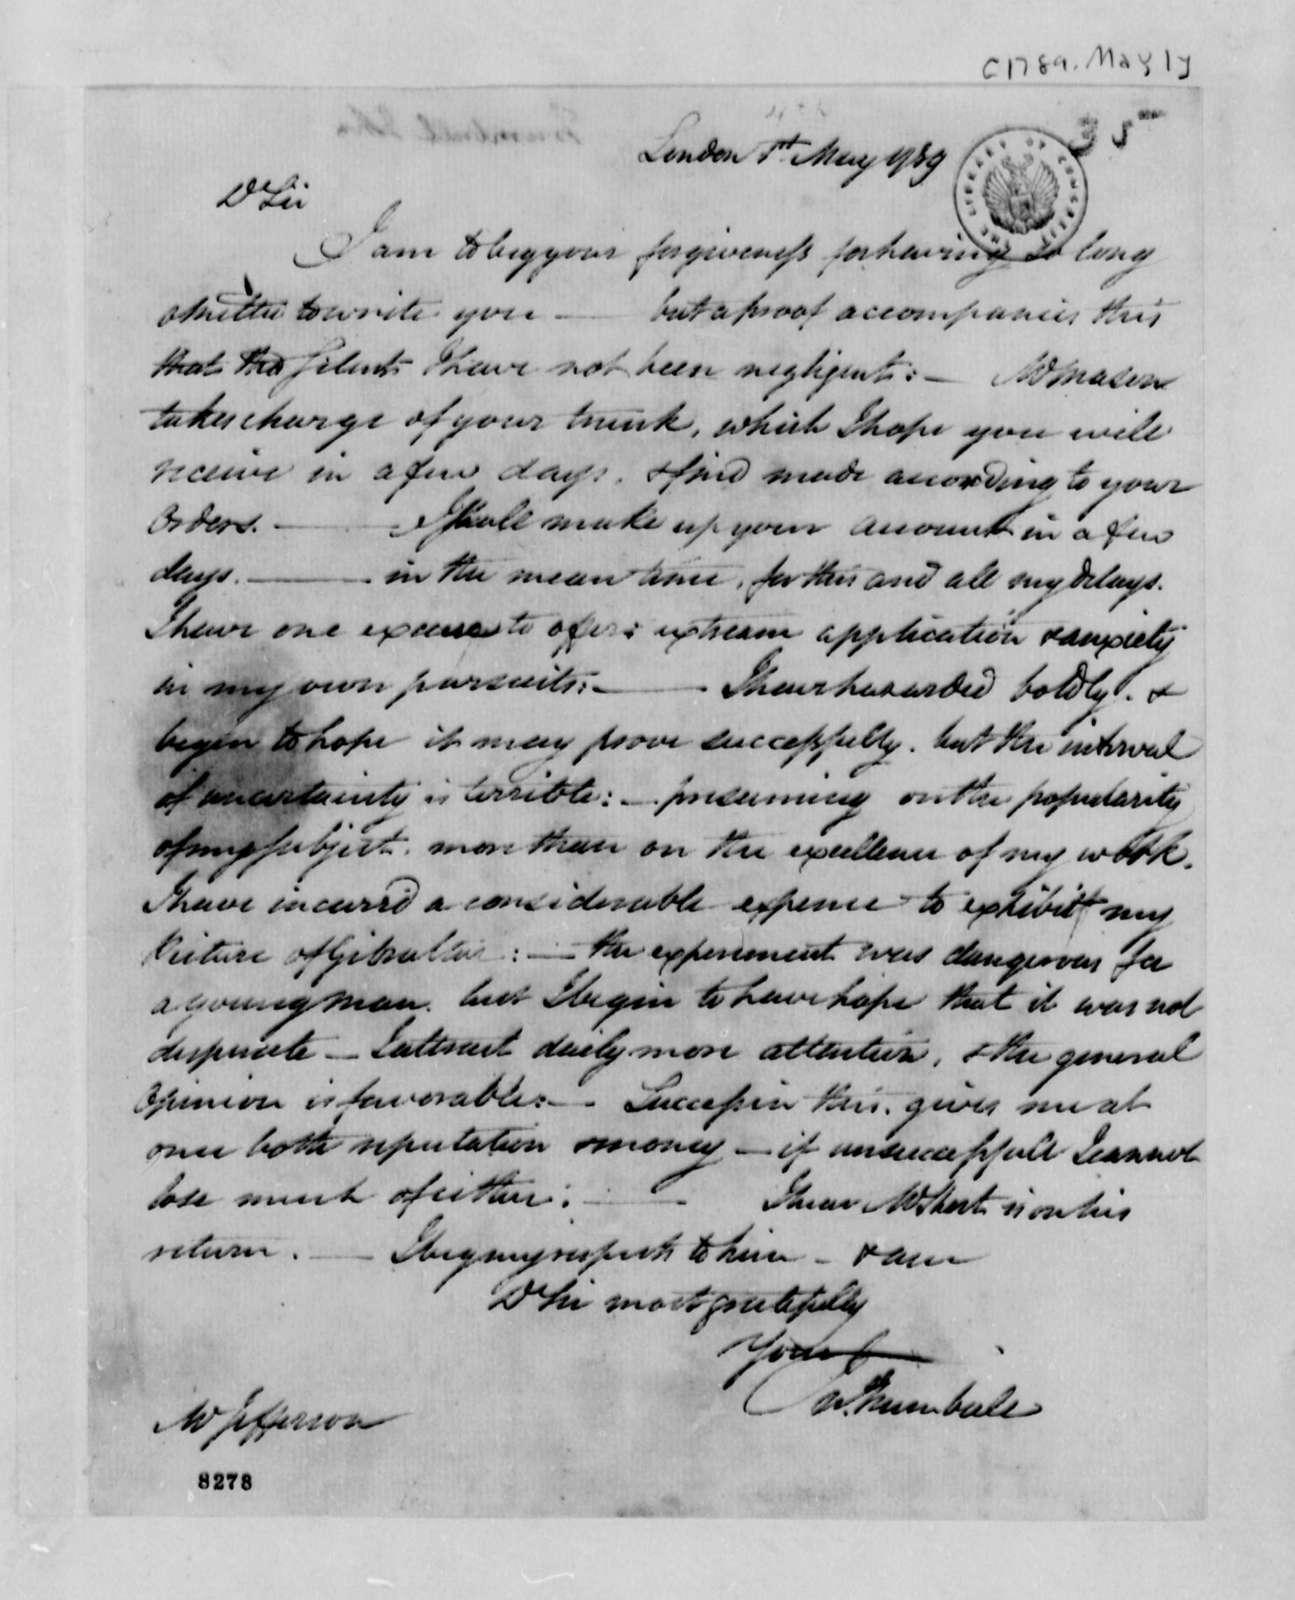 John Trumbull to Thomas Jefferson, May 1, 1789